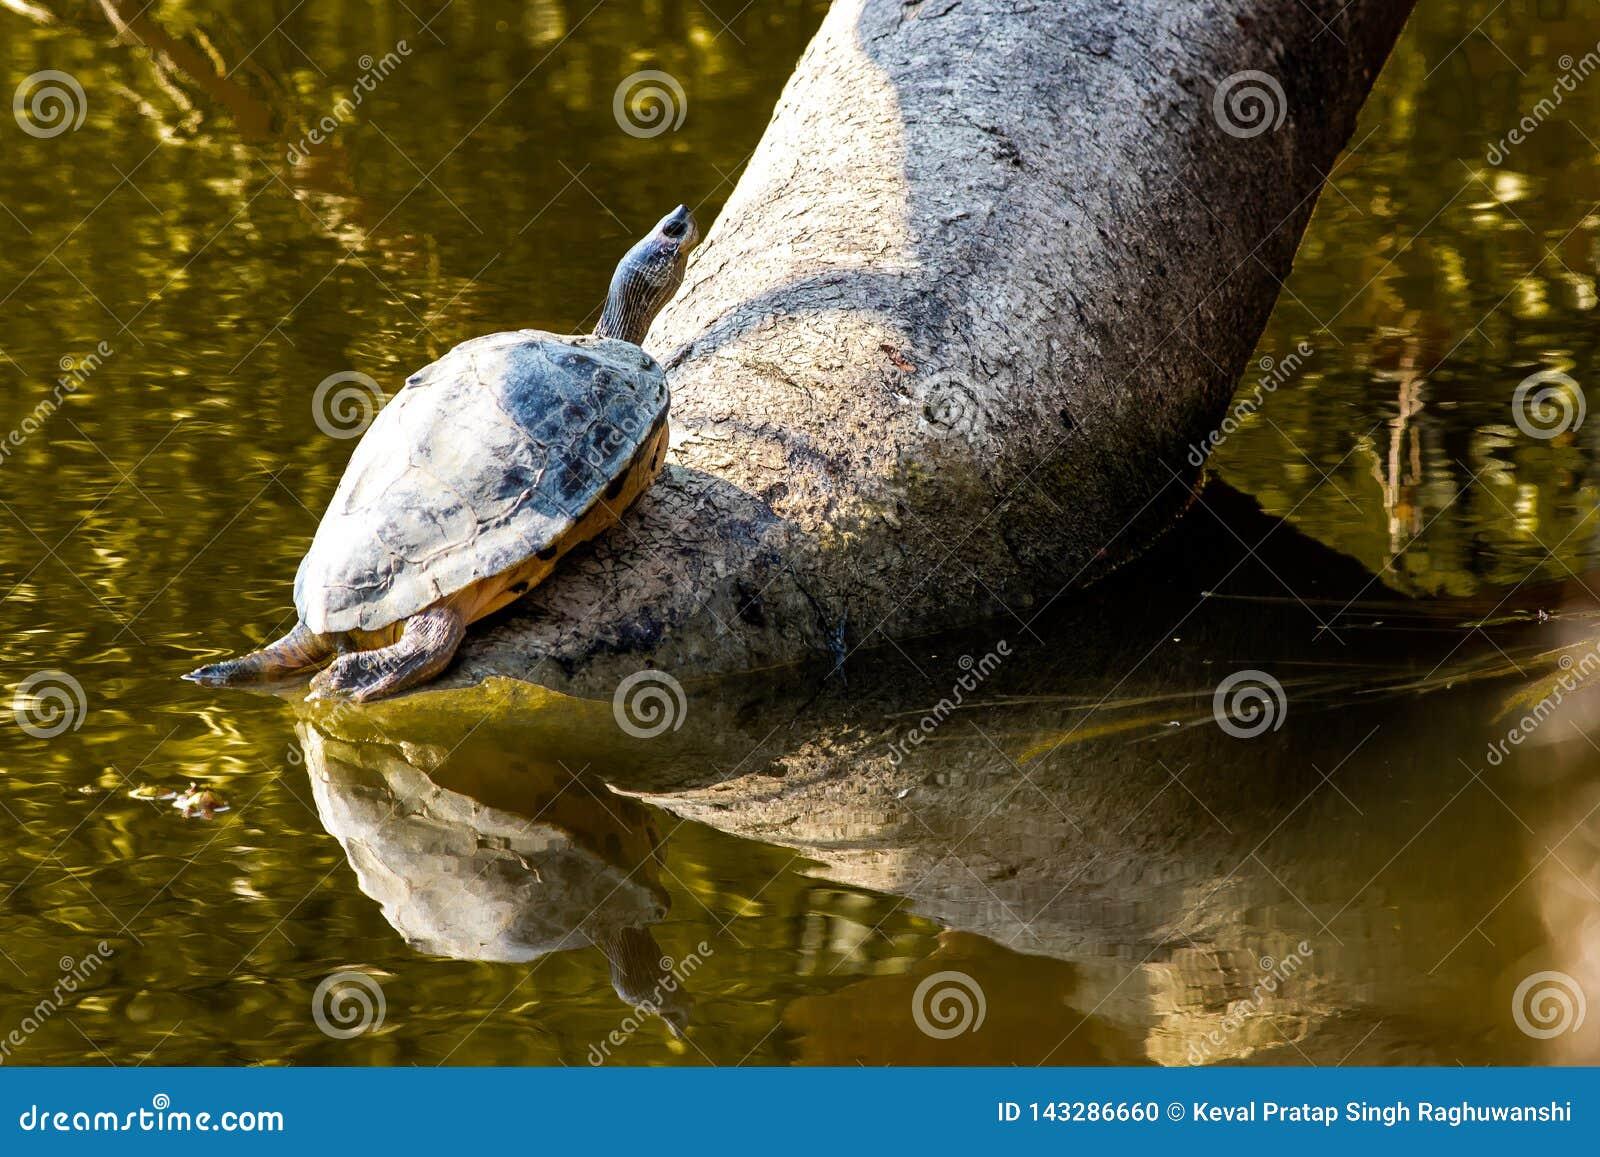 Turtle between water and tree